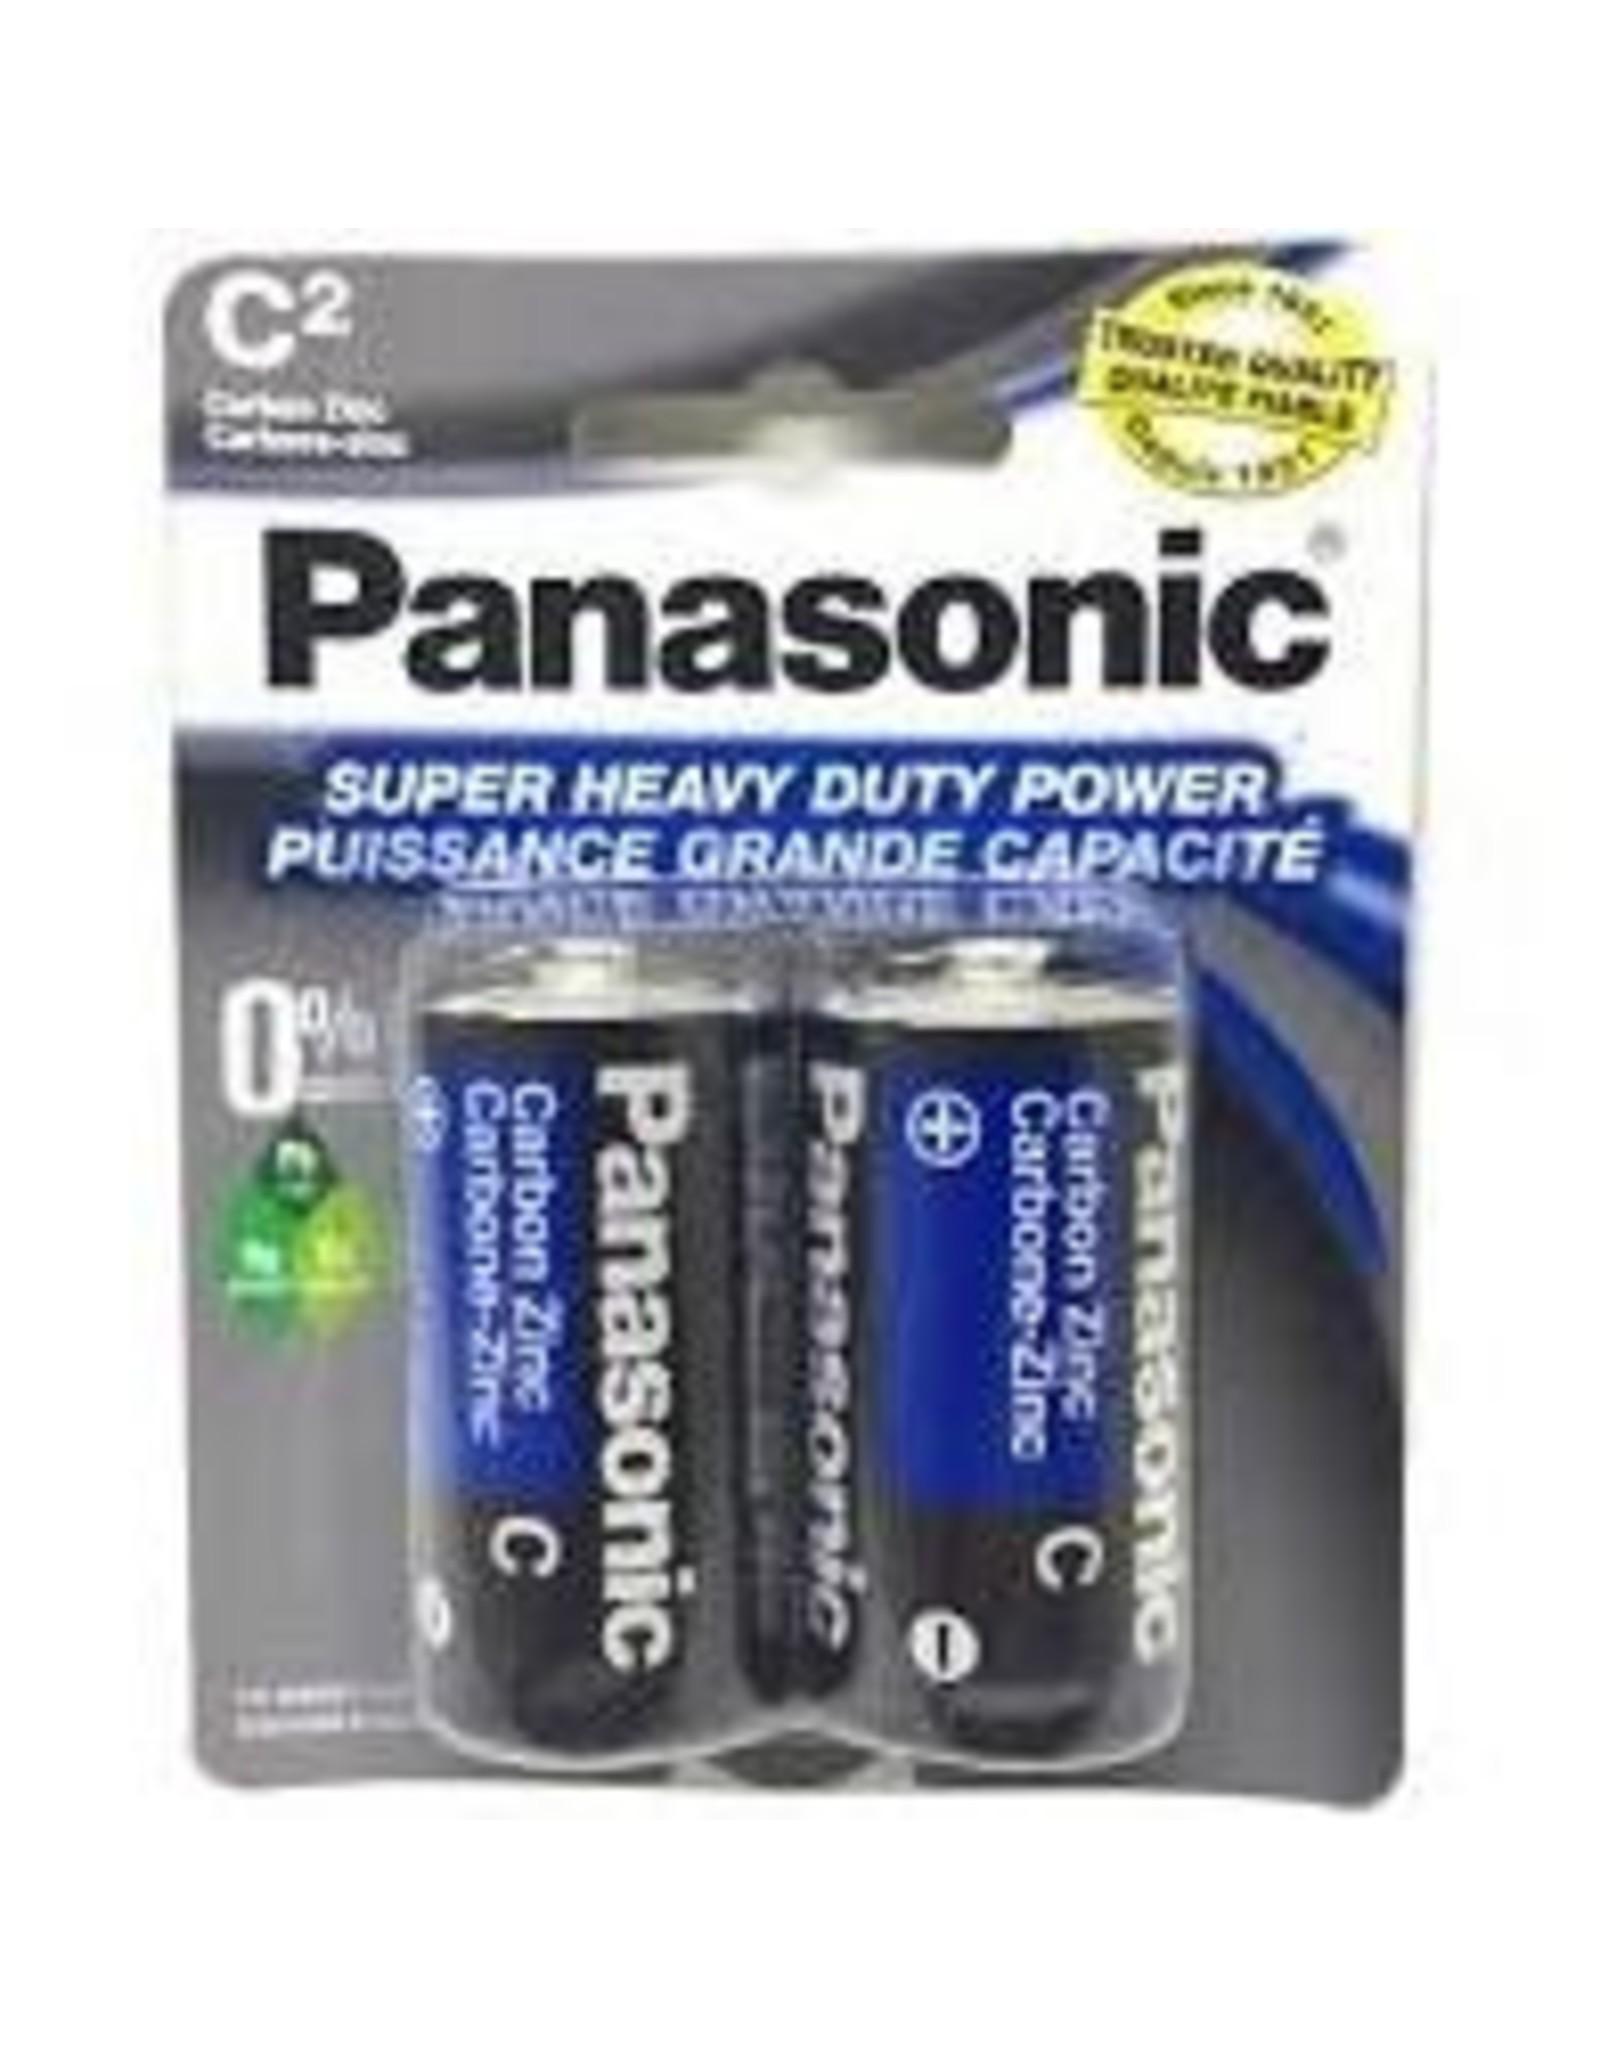 Panasonic C-2 Super Heavy Duty Batteries